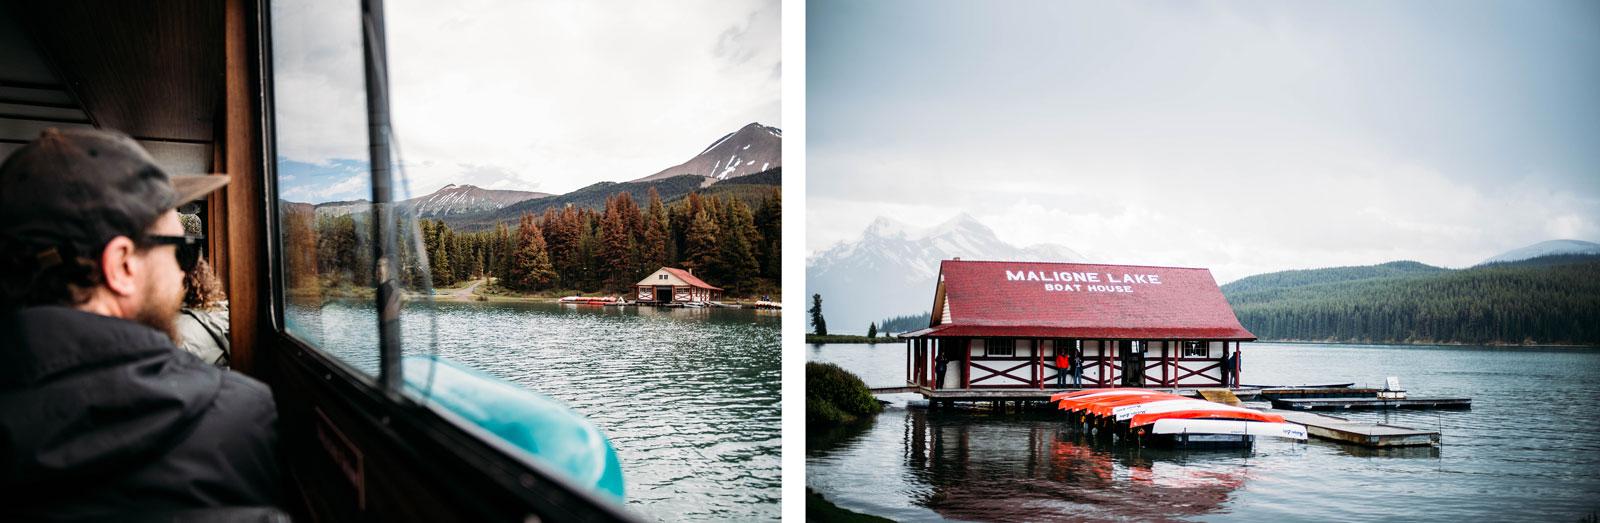 rocheuses canadiennes lac maligne jasper